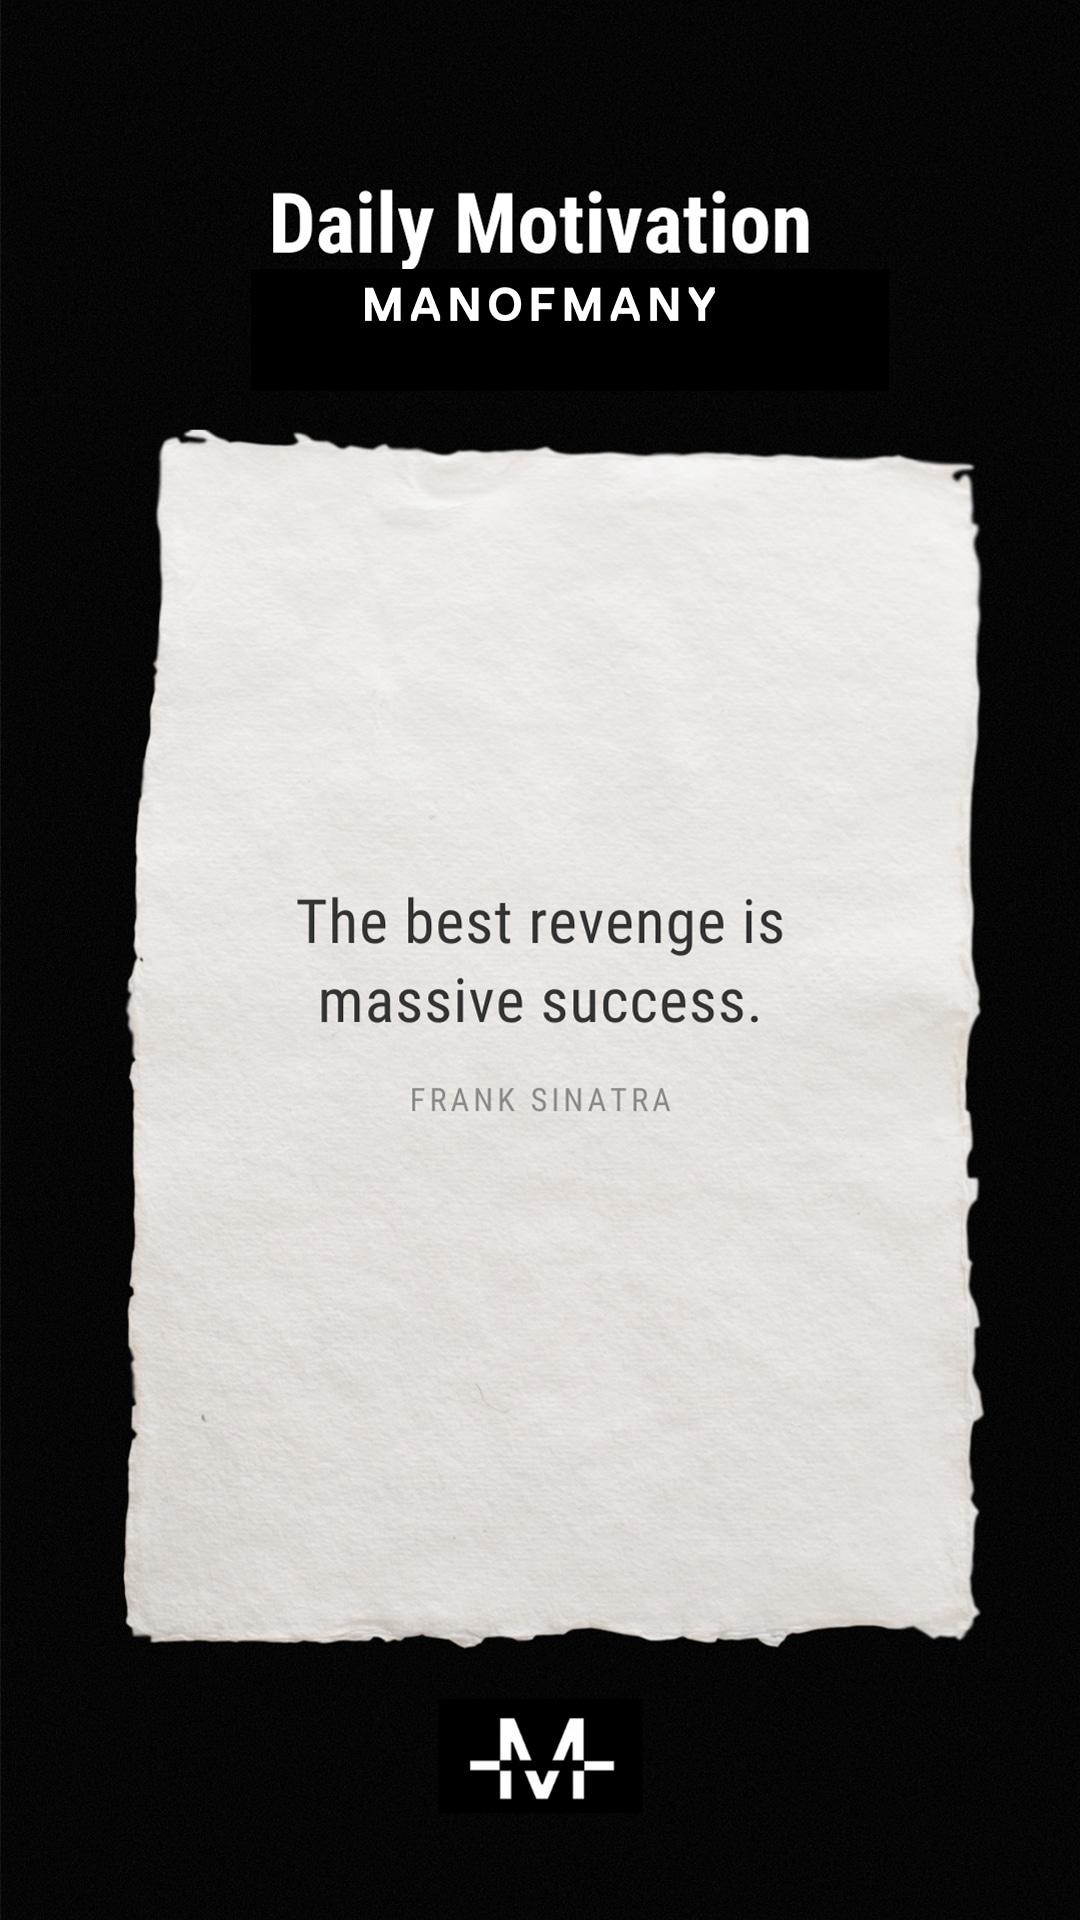 The best revenge is massive success. –Frank Sinatra quote